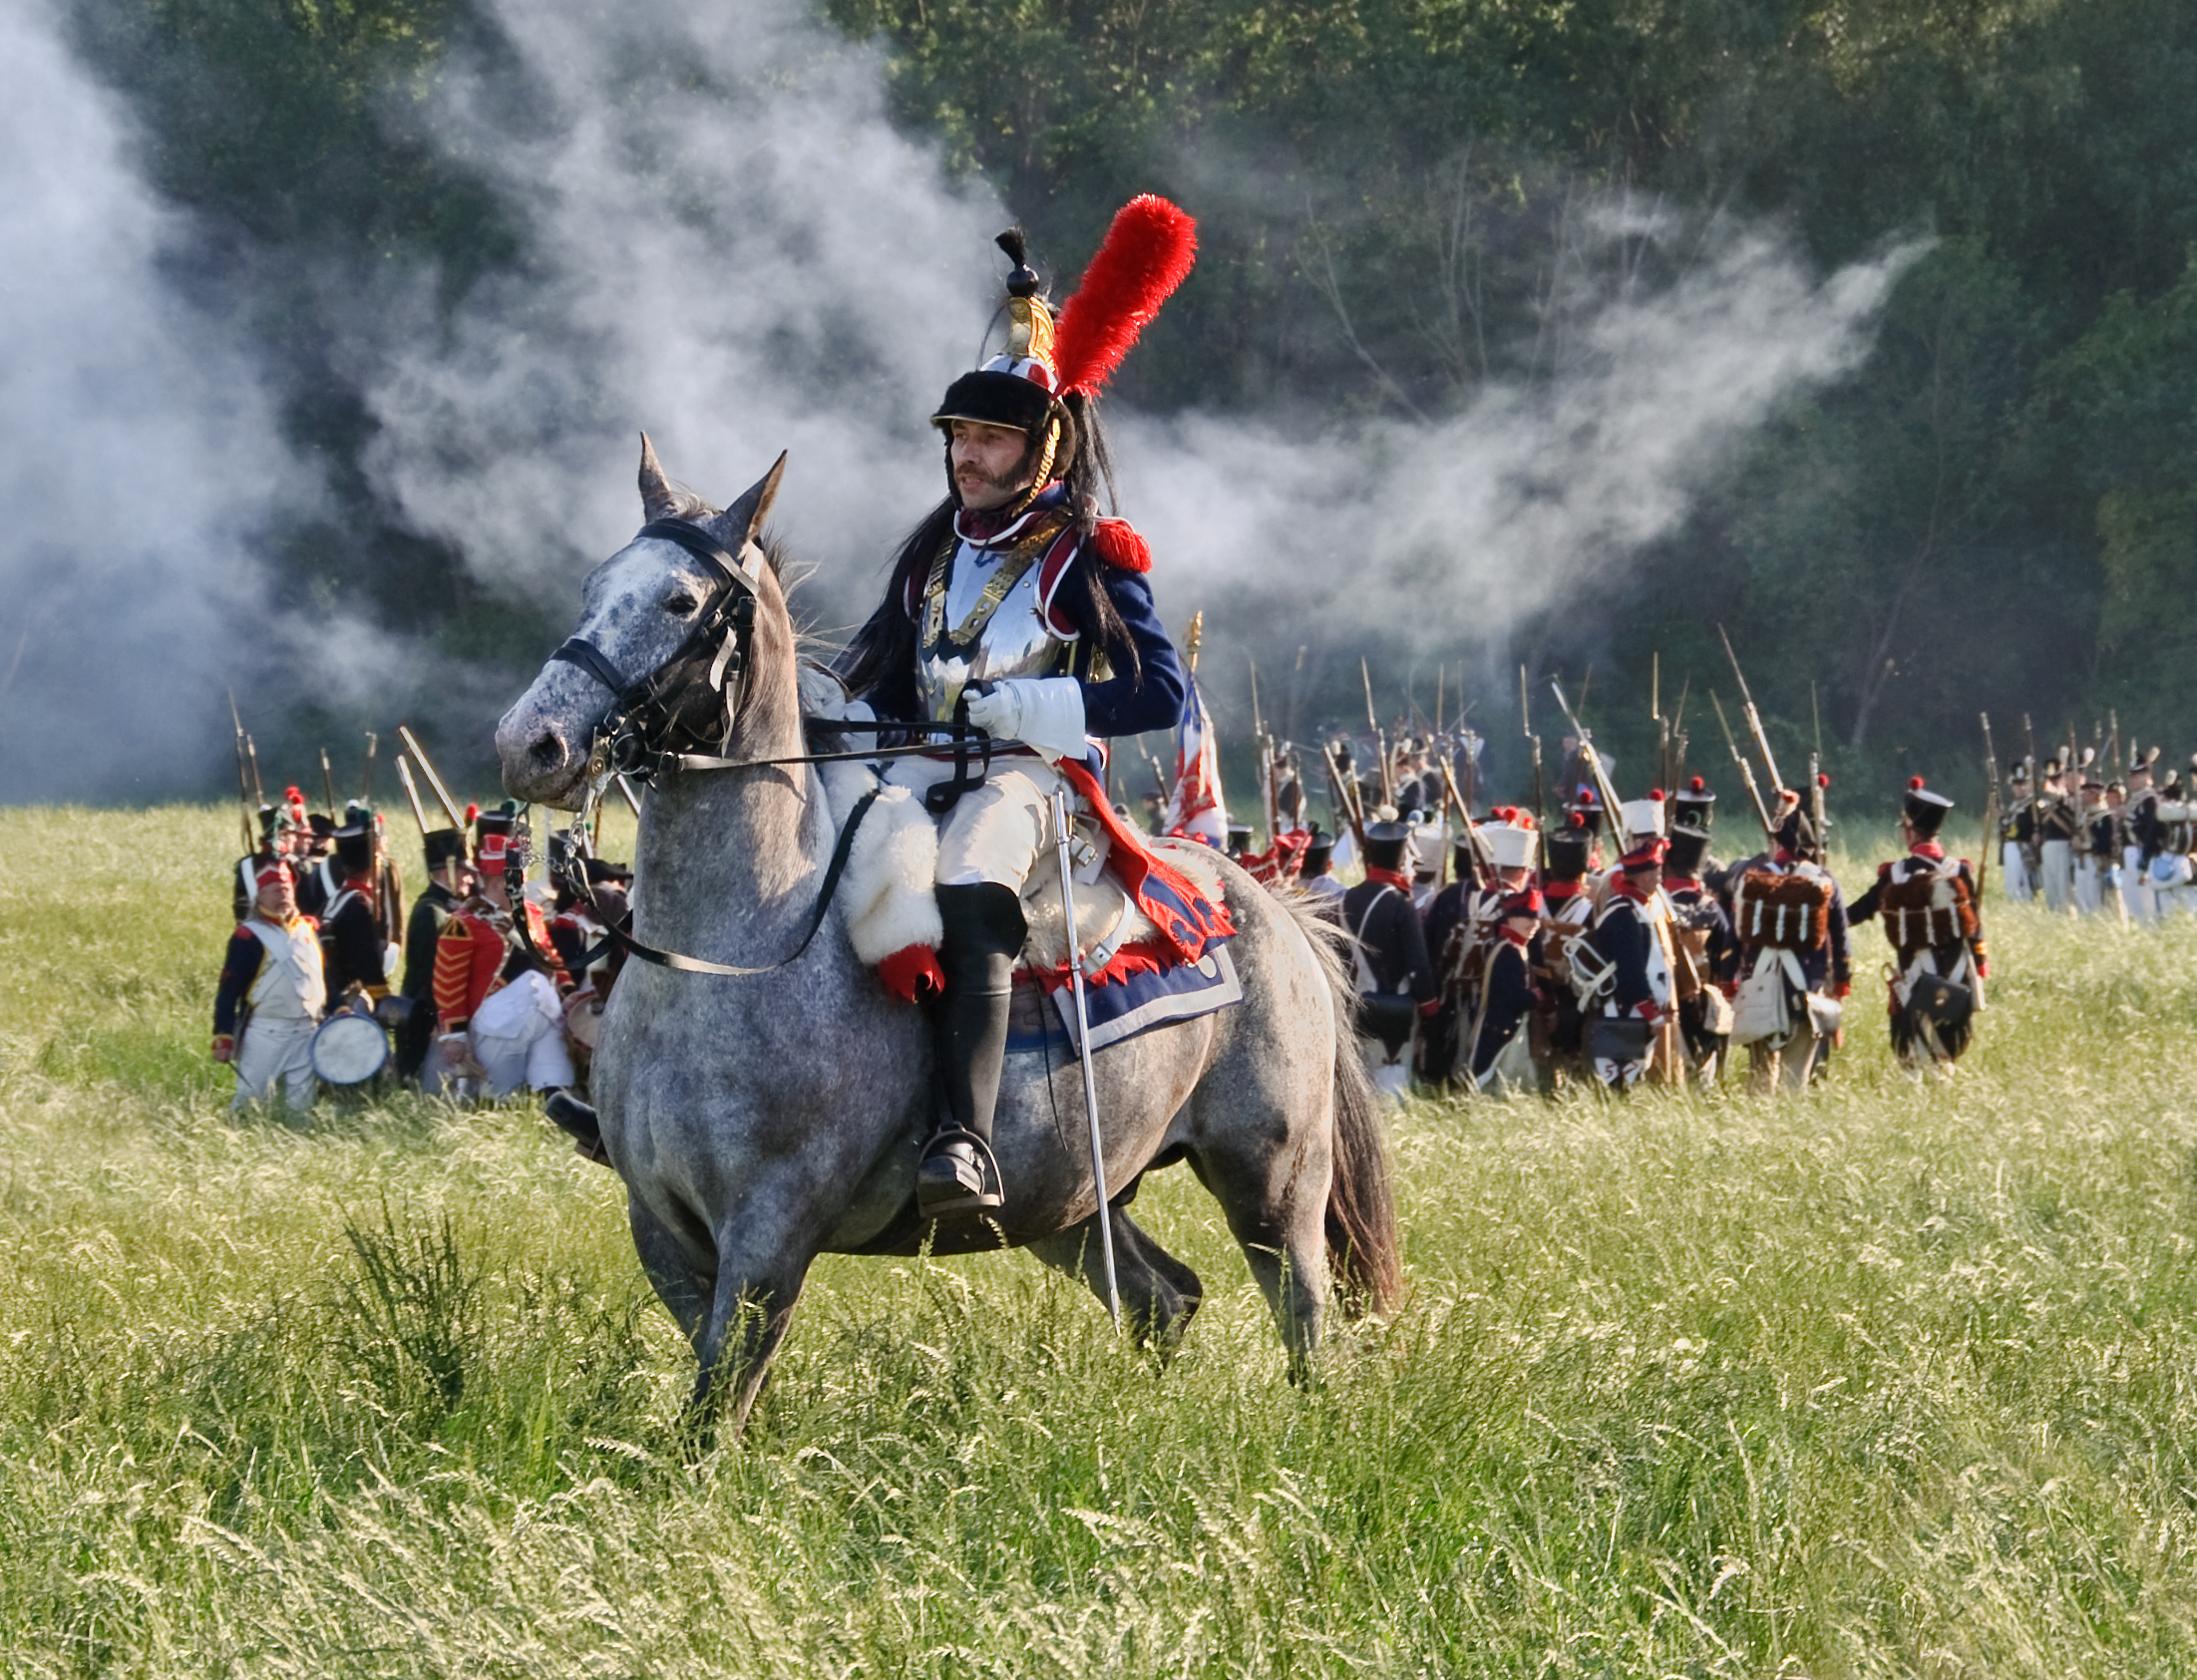 History Battle of Waterloo Battle of Waterloo Reenactment